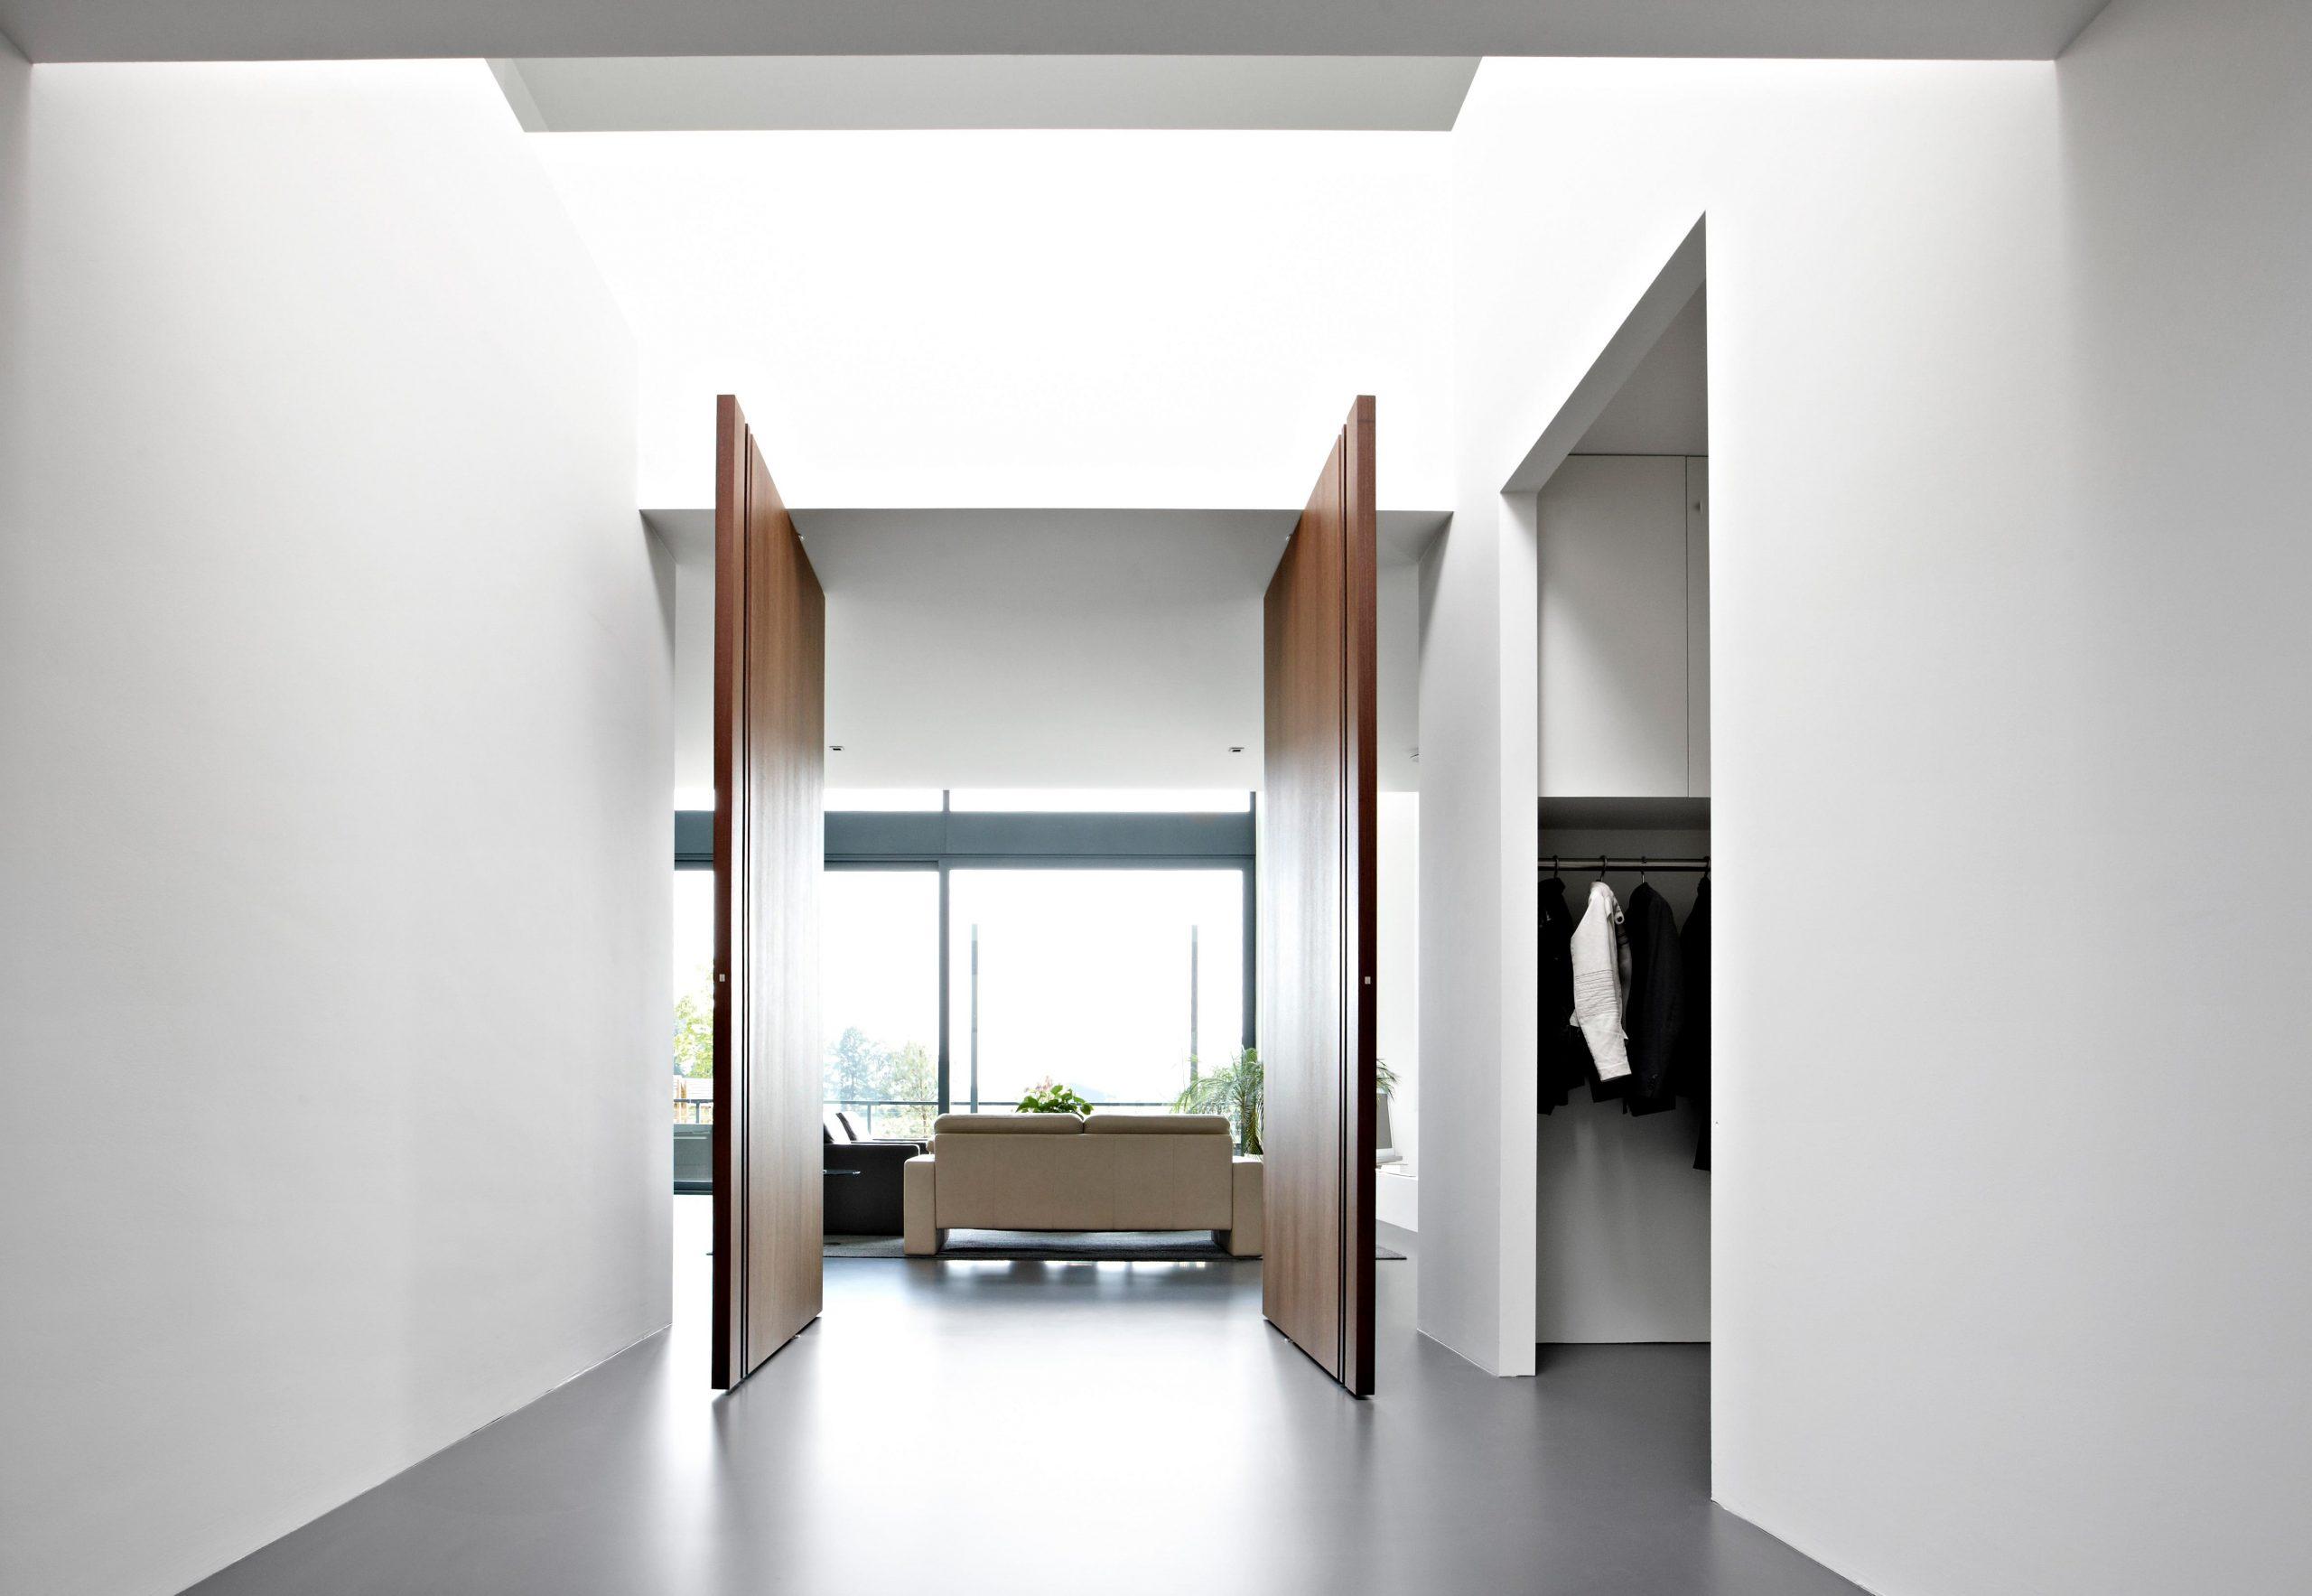 puertas-pivotantes-de-madera-bisagras-invisibles-fritsjurgens-scaled.jpg